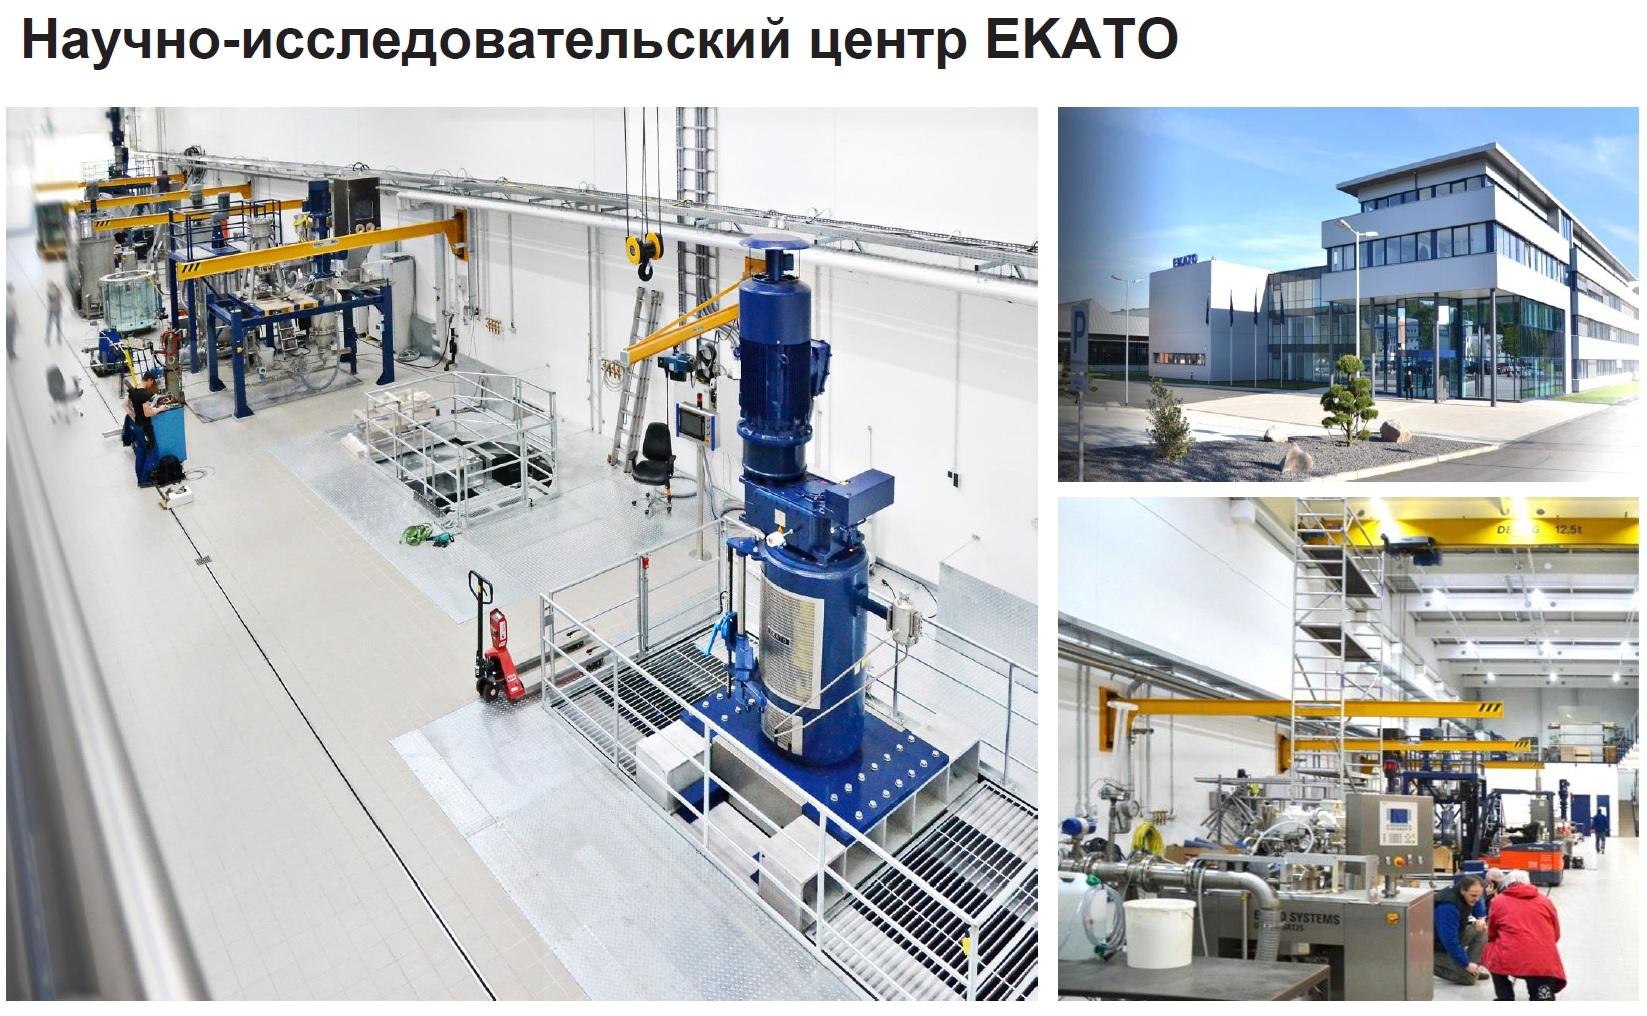 ekato industry3.jpg